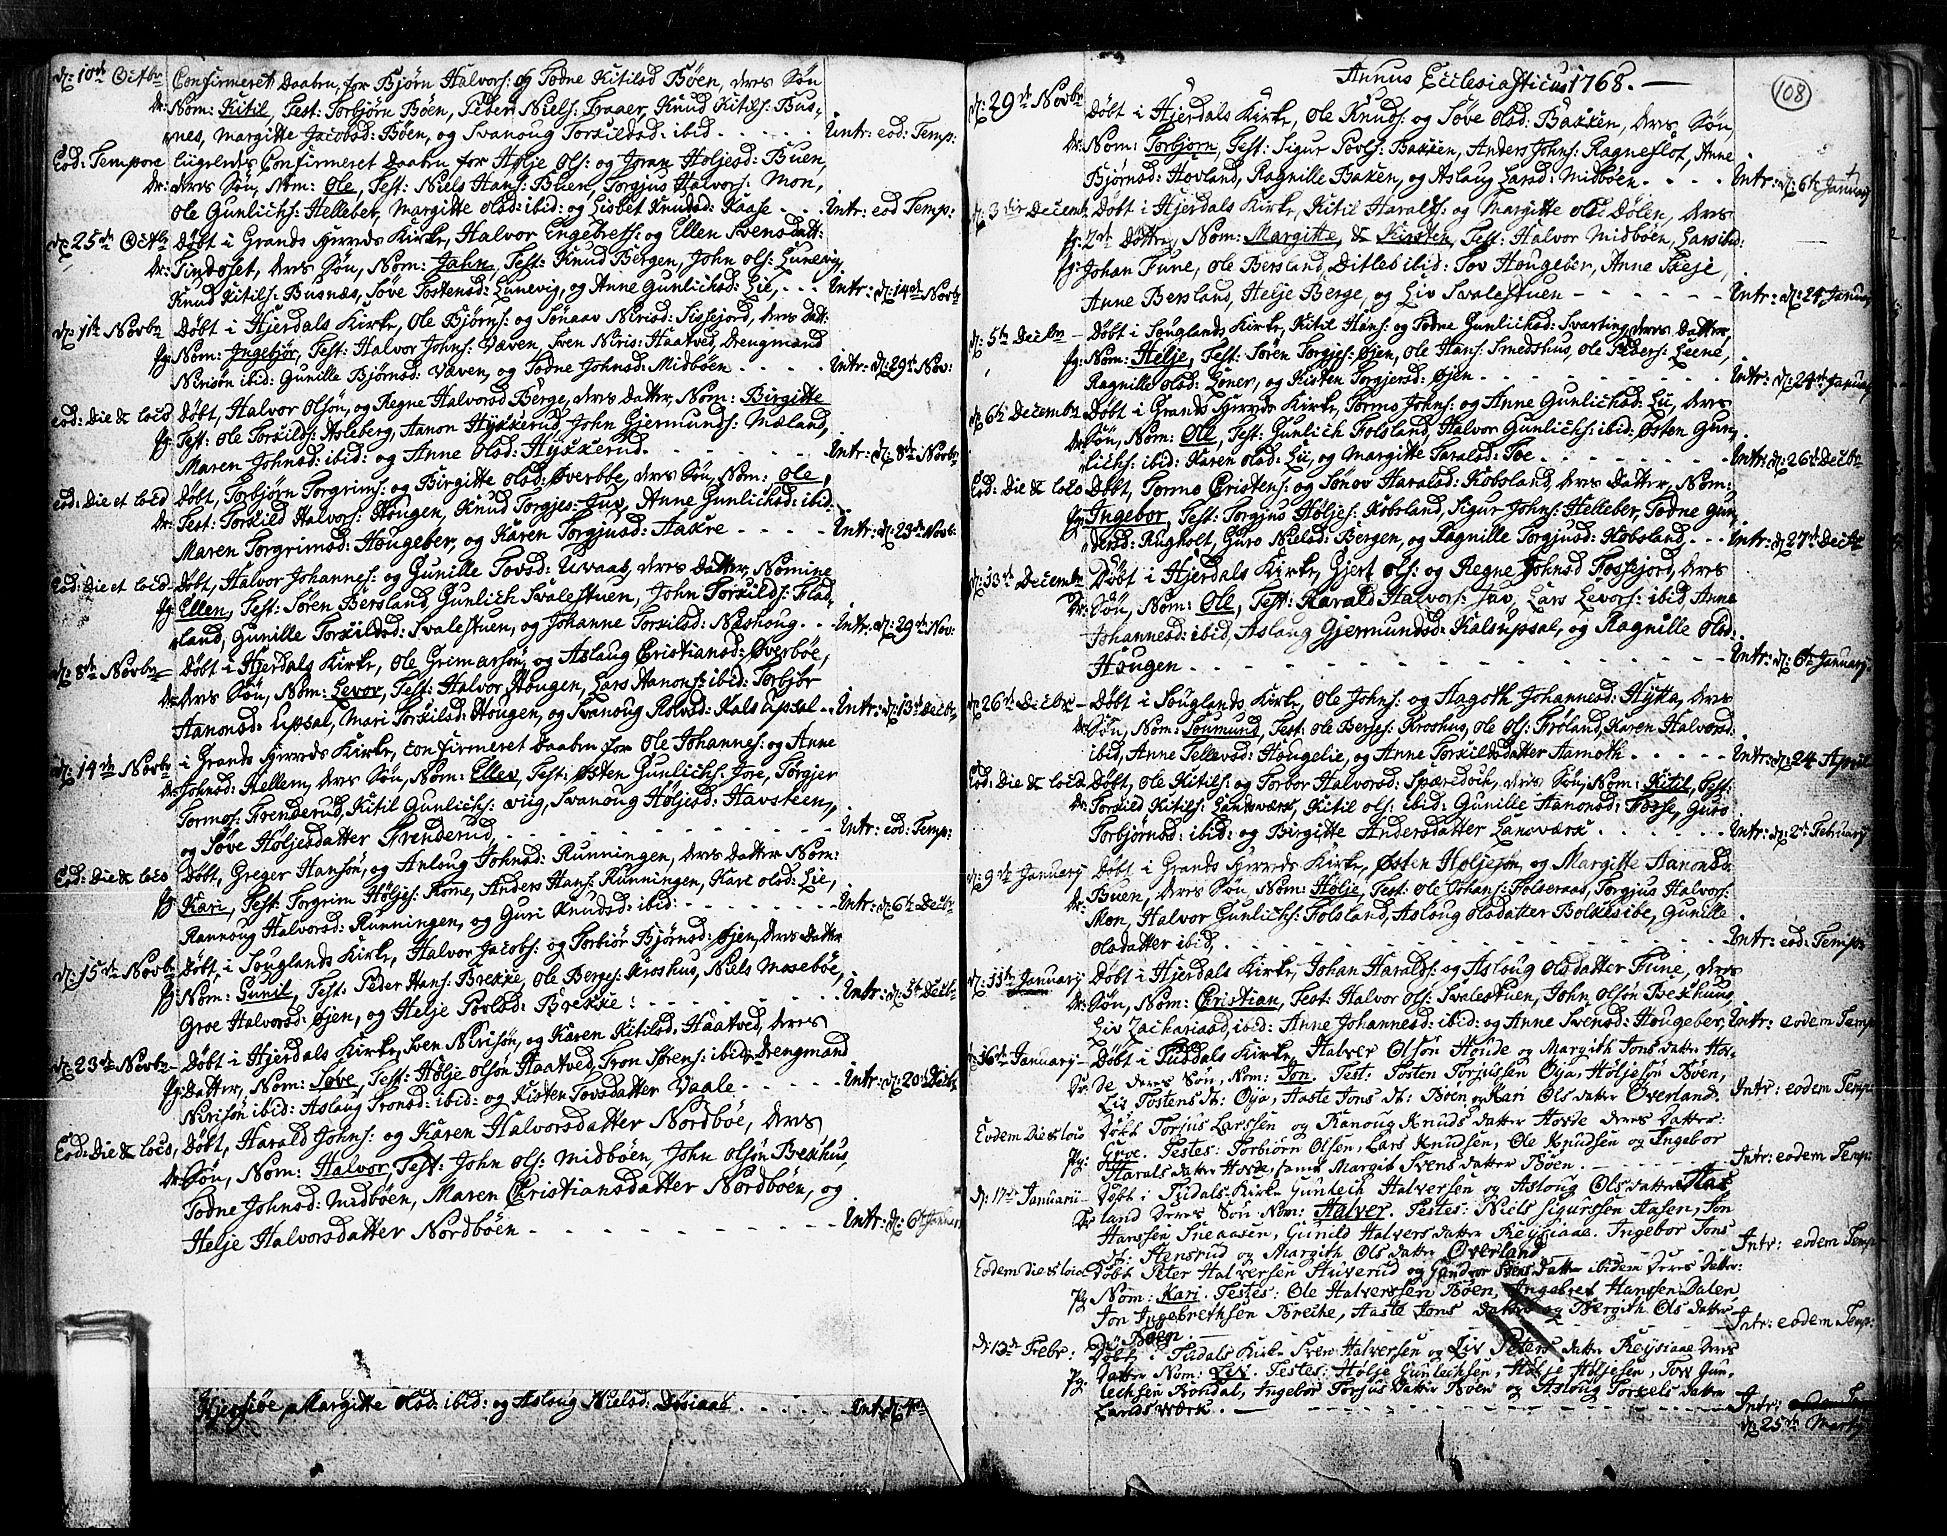 SAKO, Hjartdal kirkebøker, F/Fa/L0003: Ministerialbok nr. I 3, 1727-1775, s. 108